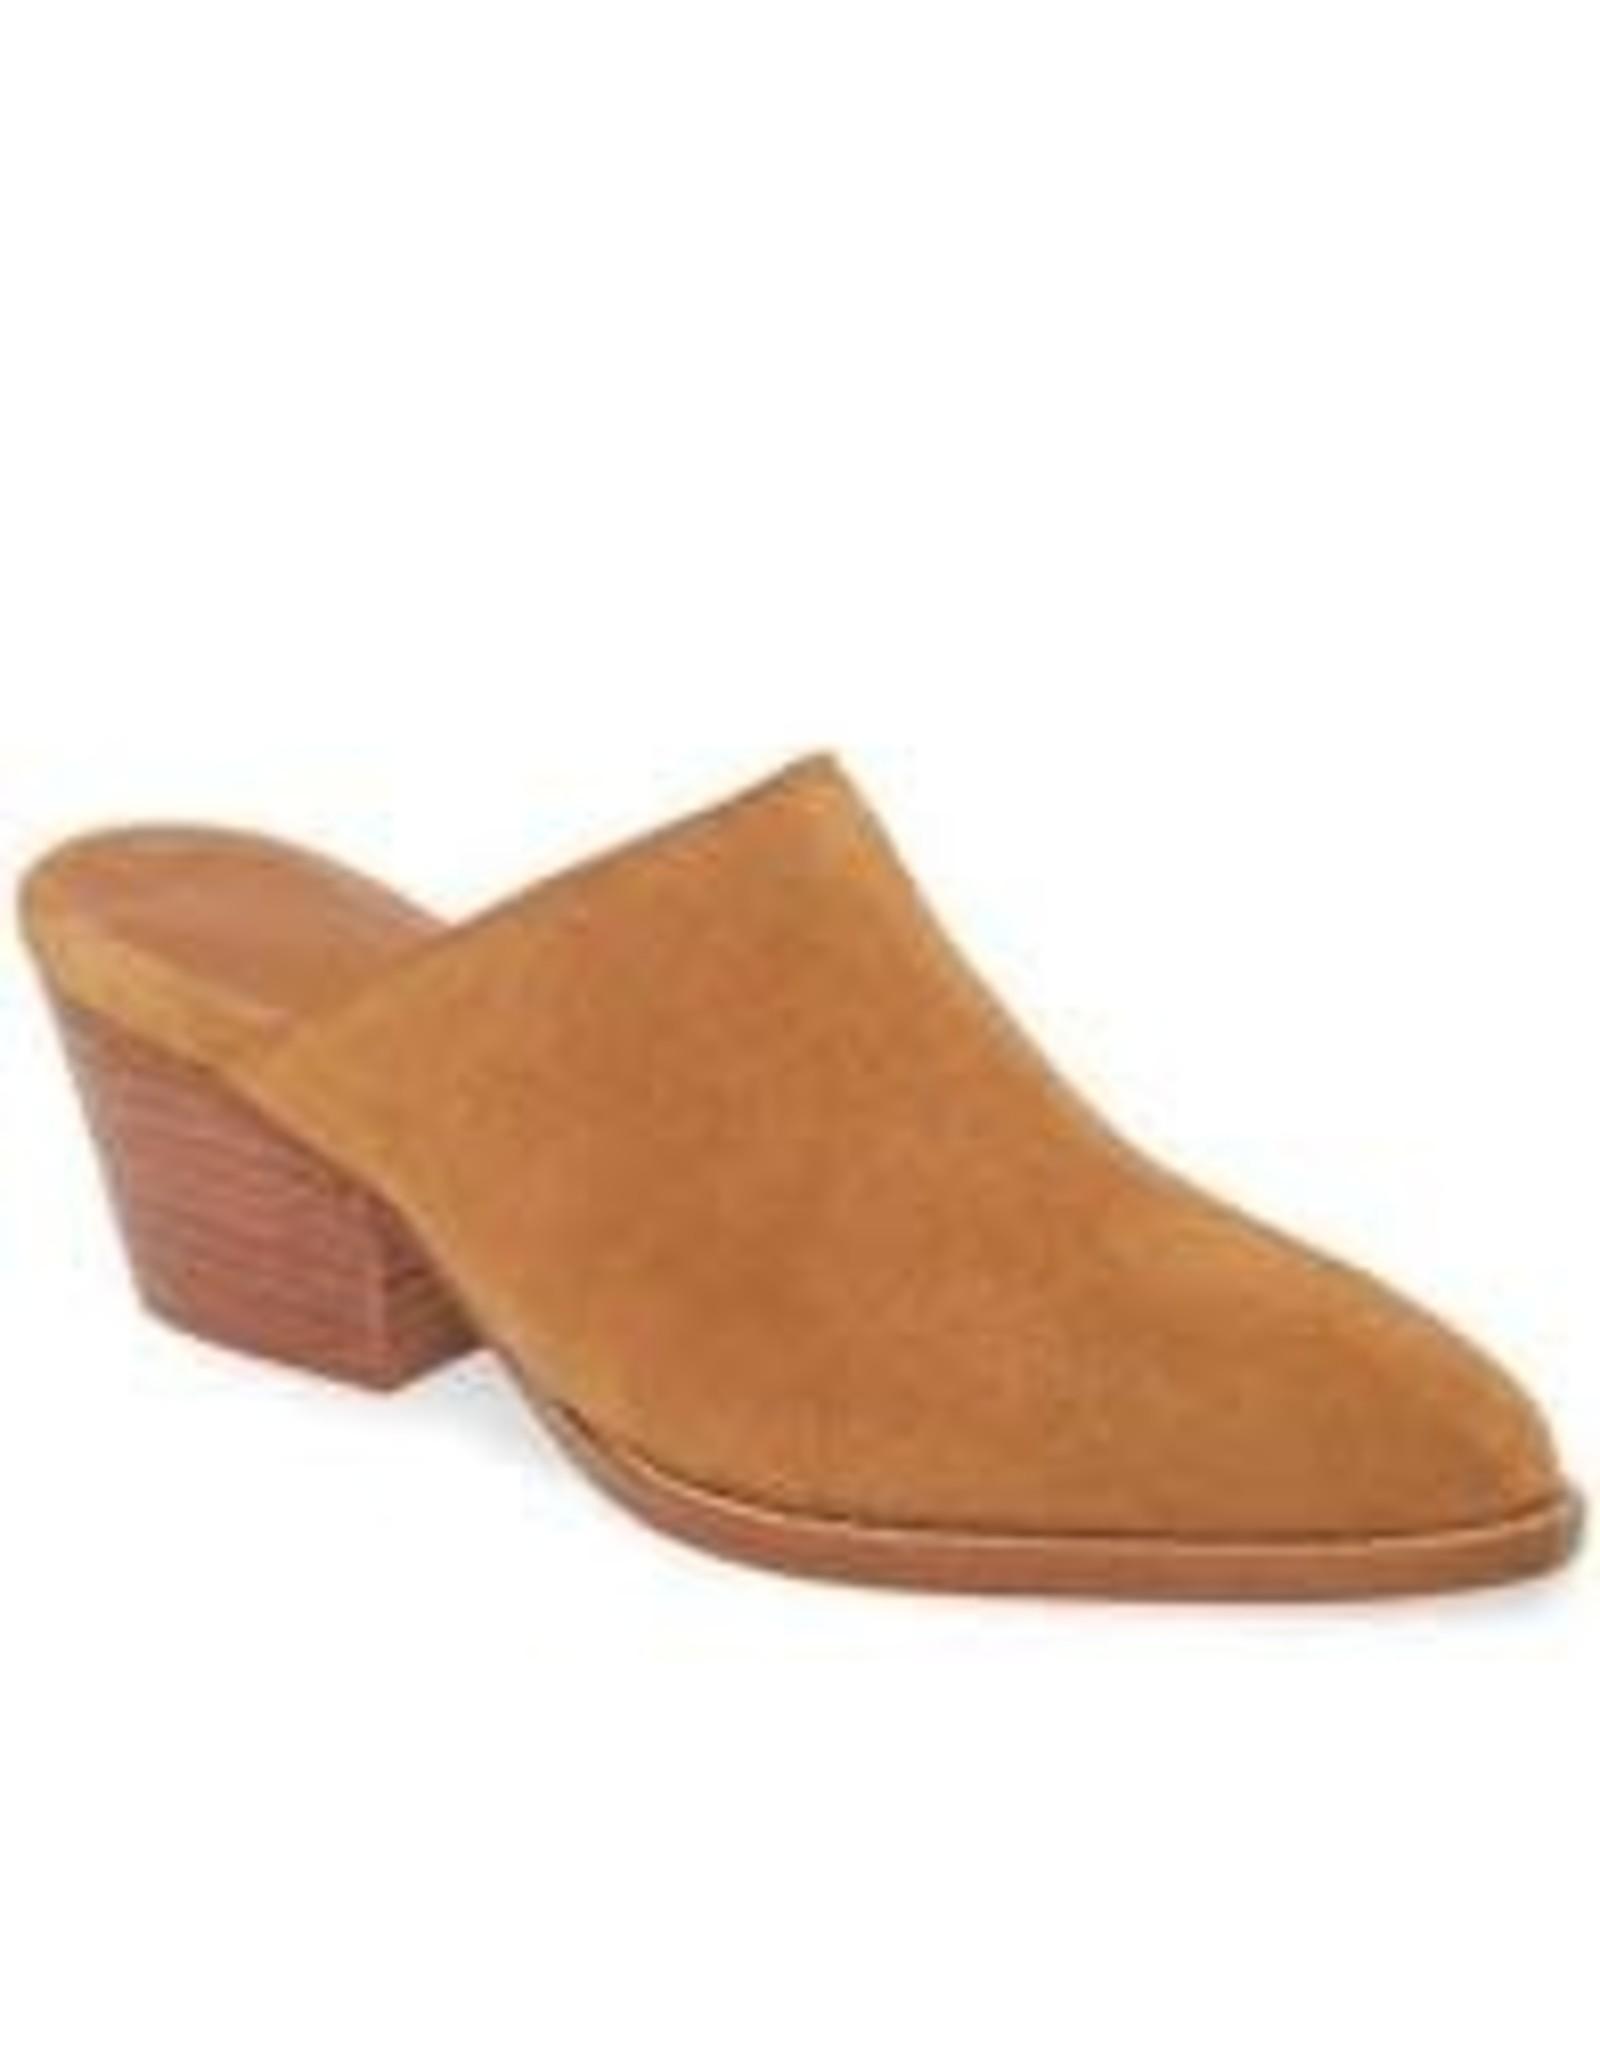 Matisse Footwear Camelot Mule